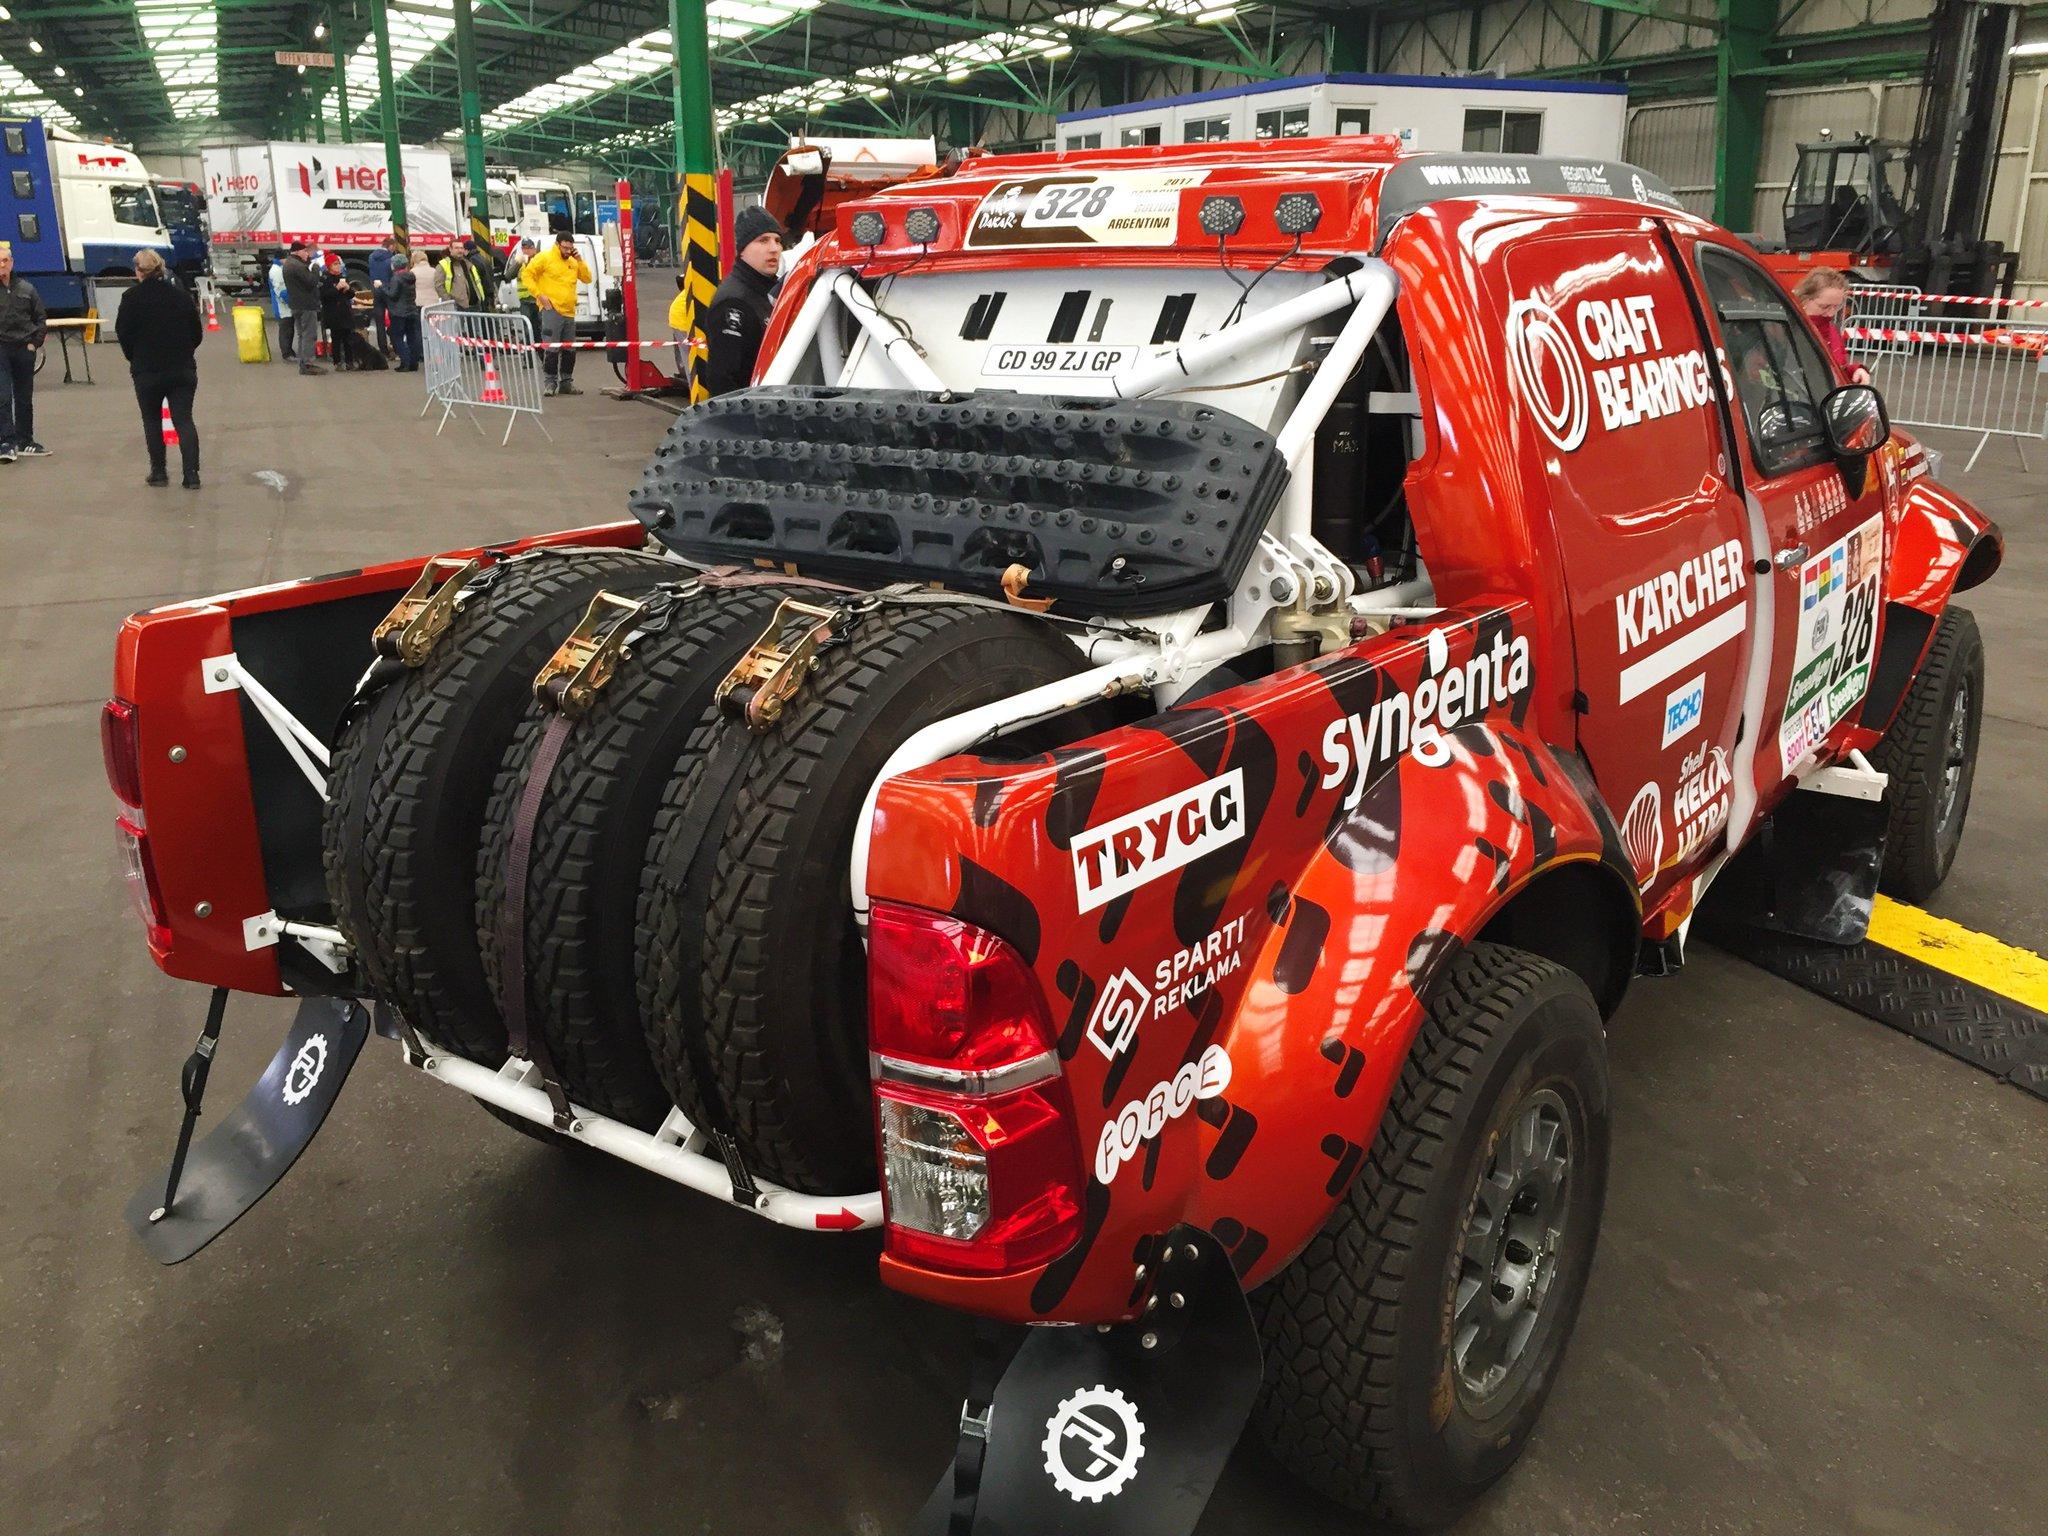 2017 Rallye Raid Dakar Paraguay - Bolivia - Argentina [2-14 Enero] - Página 5 CyBnBDrWEAA2TWV